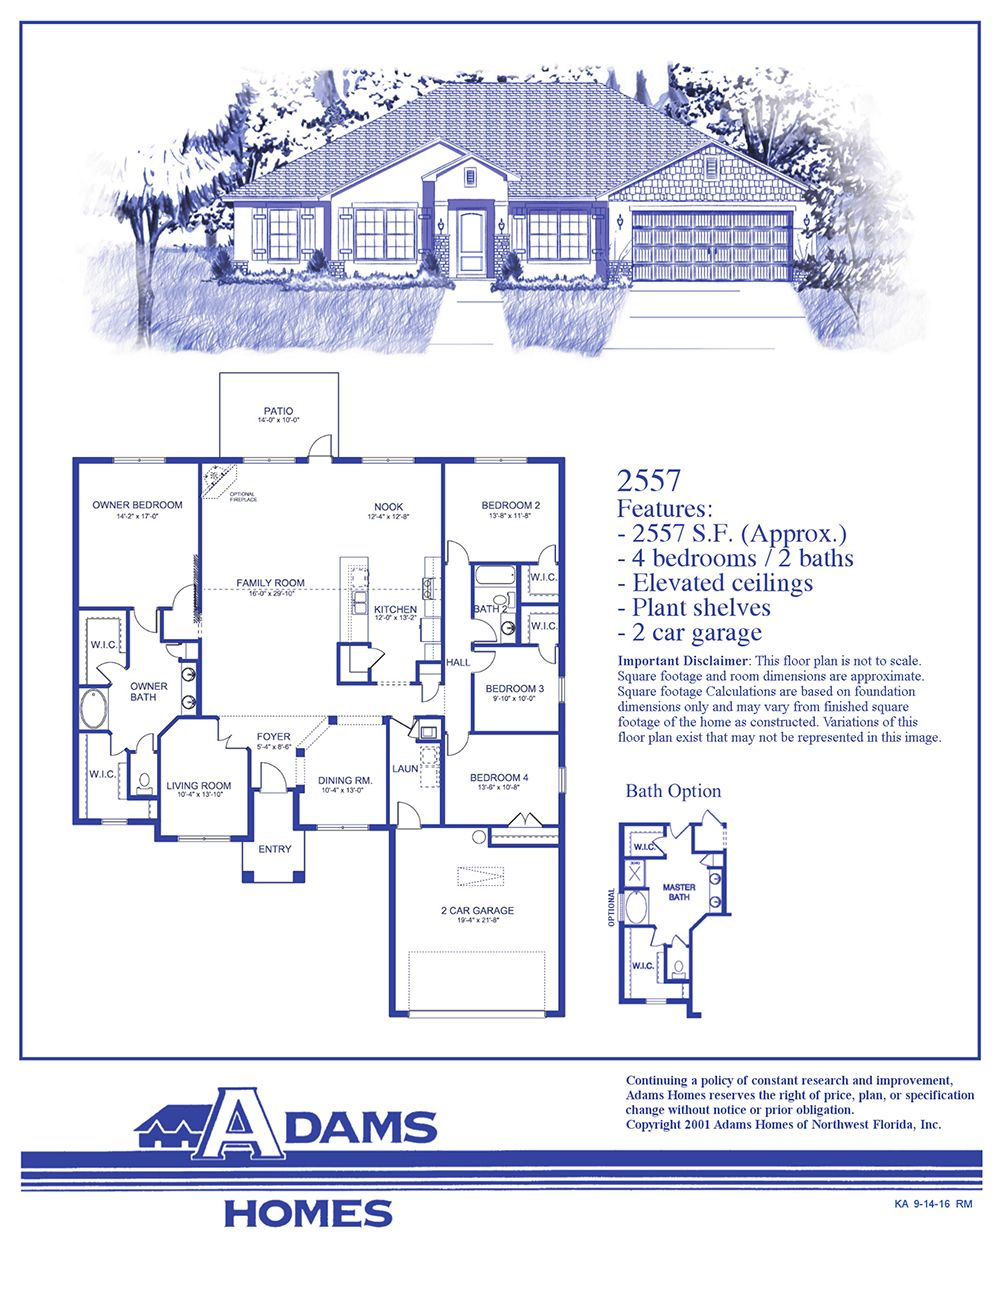 Http Www Adamshomes Com Locations Florida Ocala 2557 Jpg Ocala Adams Homes Florida